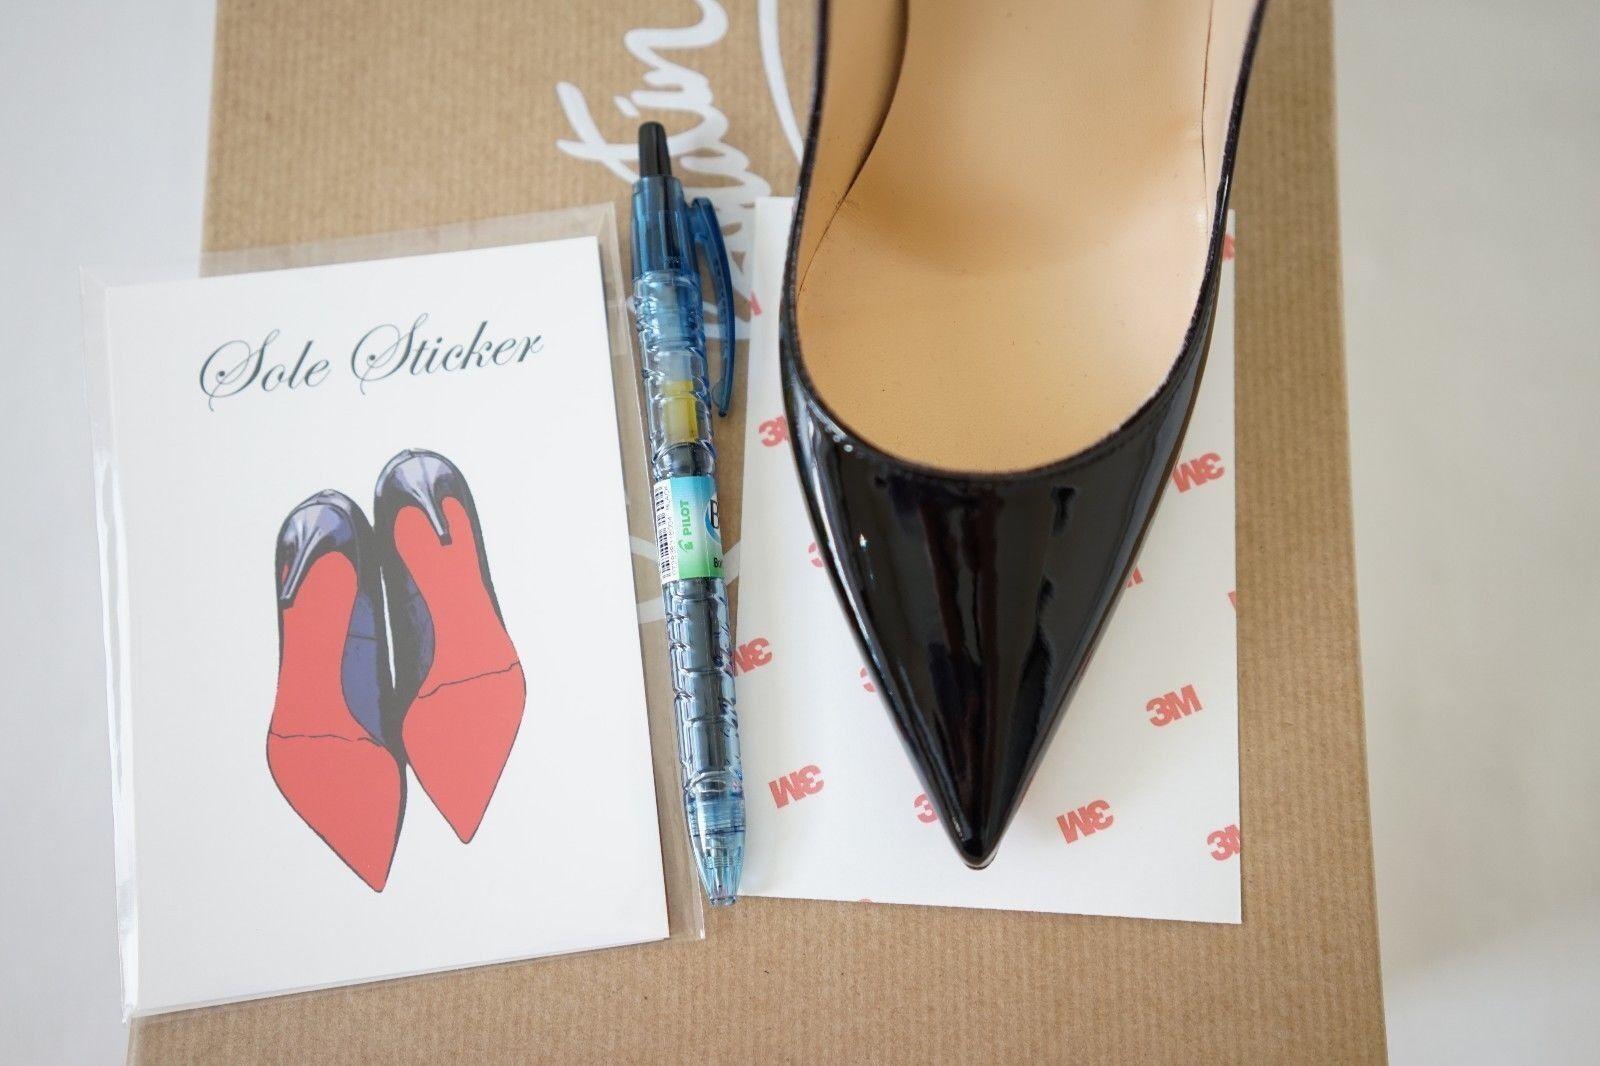 408015e21a44 Женская обувь на высоком каблуке Crystal Clear 3M sole protector guard for Christian  Louboutin red bottom heels